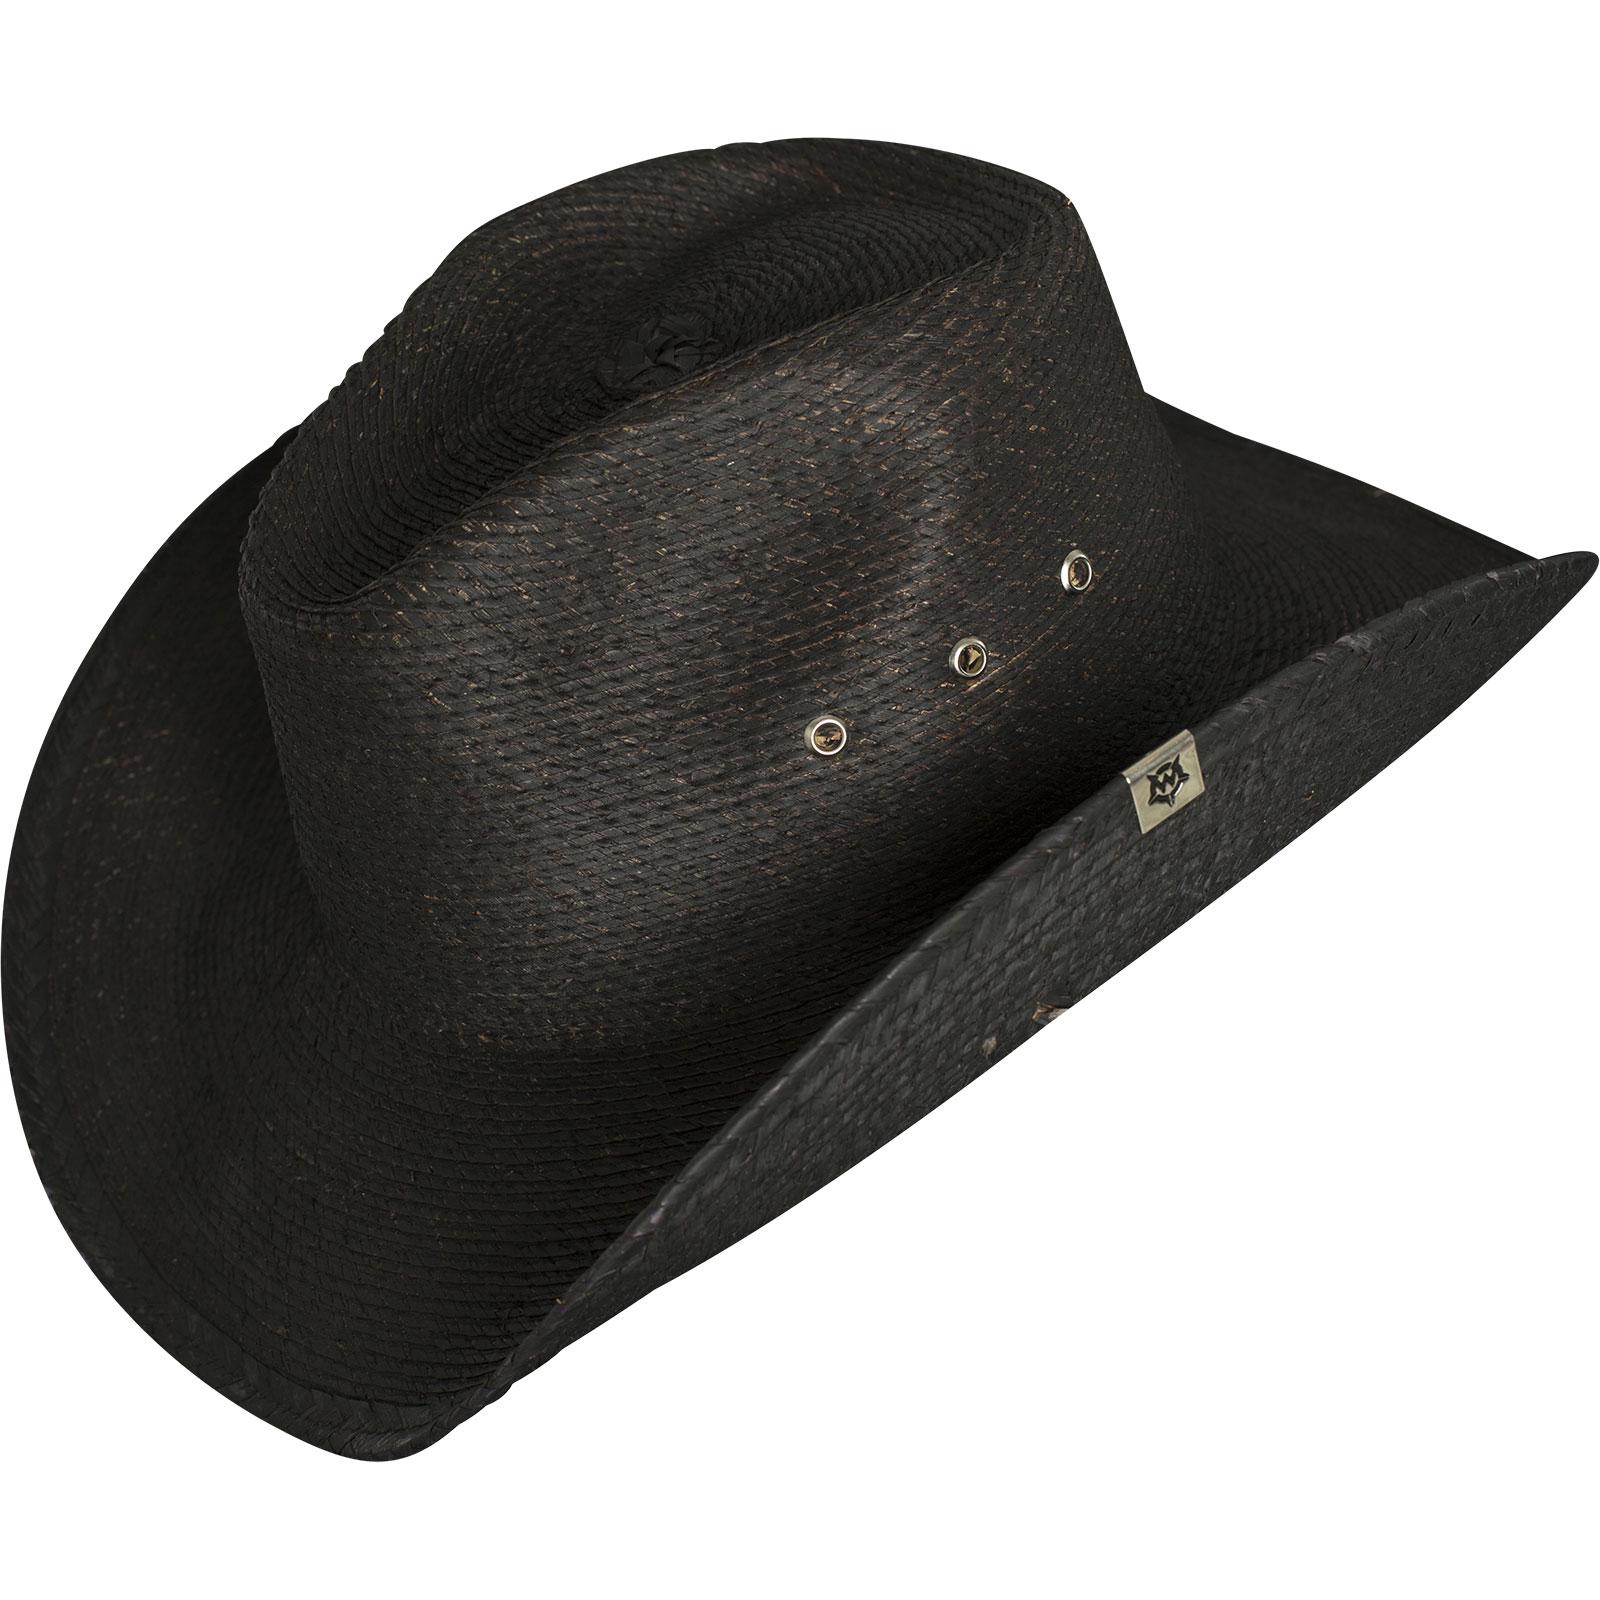 ... Wornstar Hat Essentials Hellrider Black Rocker Cowboy Hat Black e50ae69e5a1